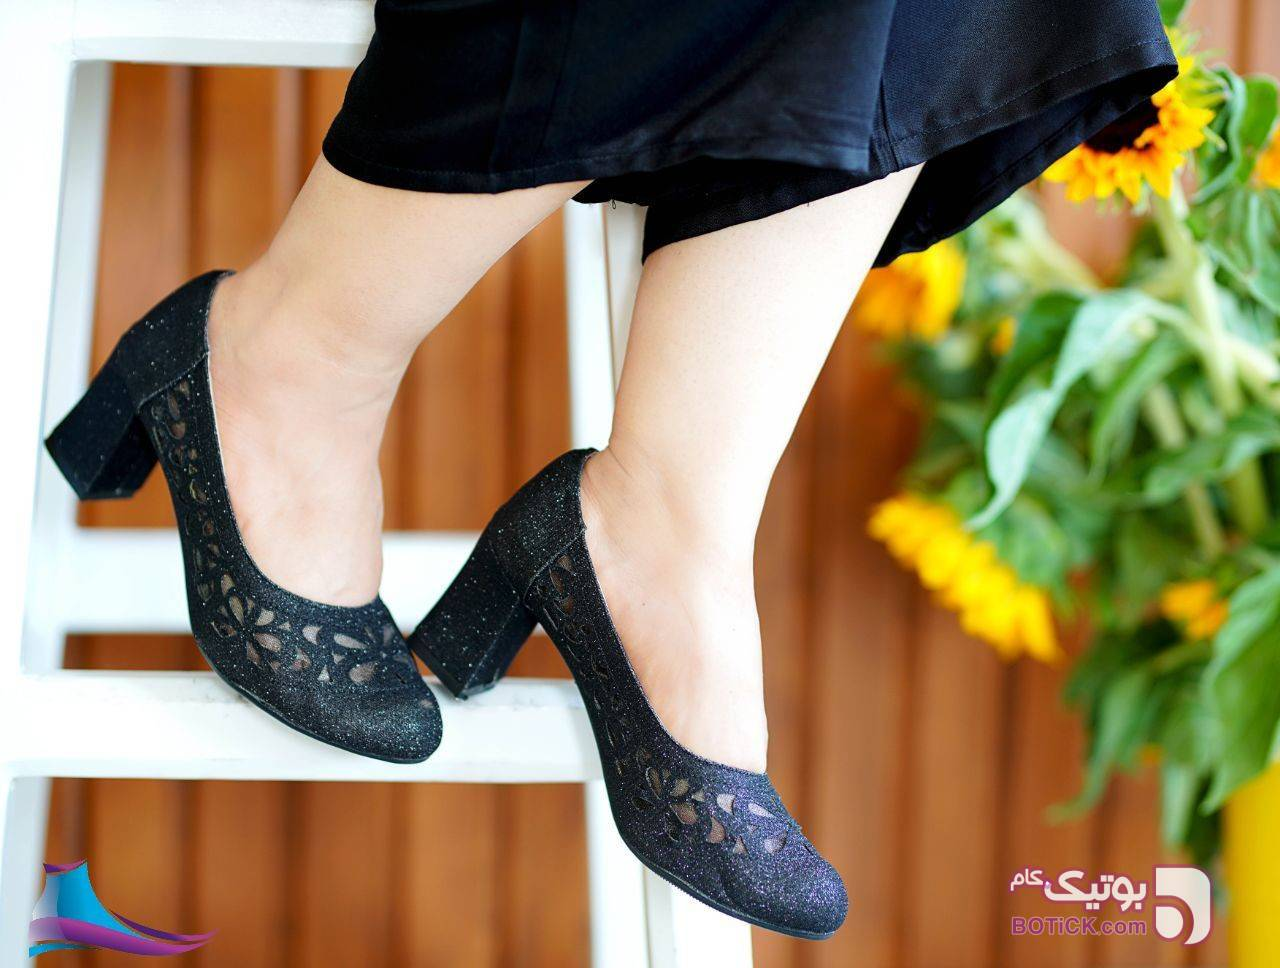 کفش شیک کد 670 پاشنه 7سانت مشکی كفش زنانه